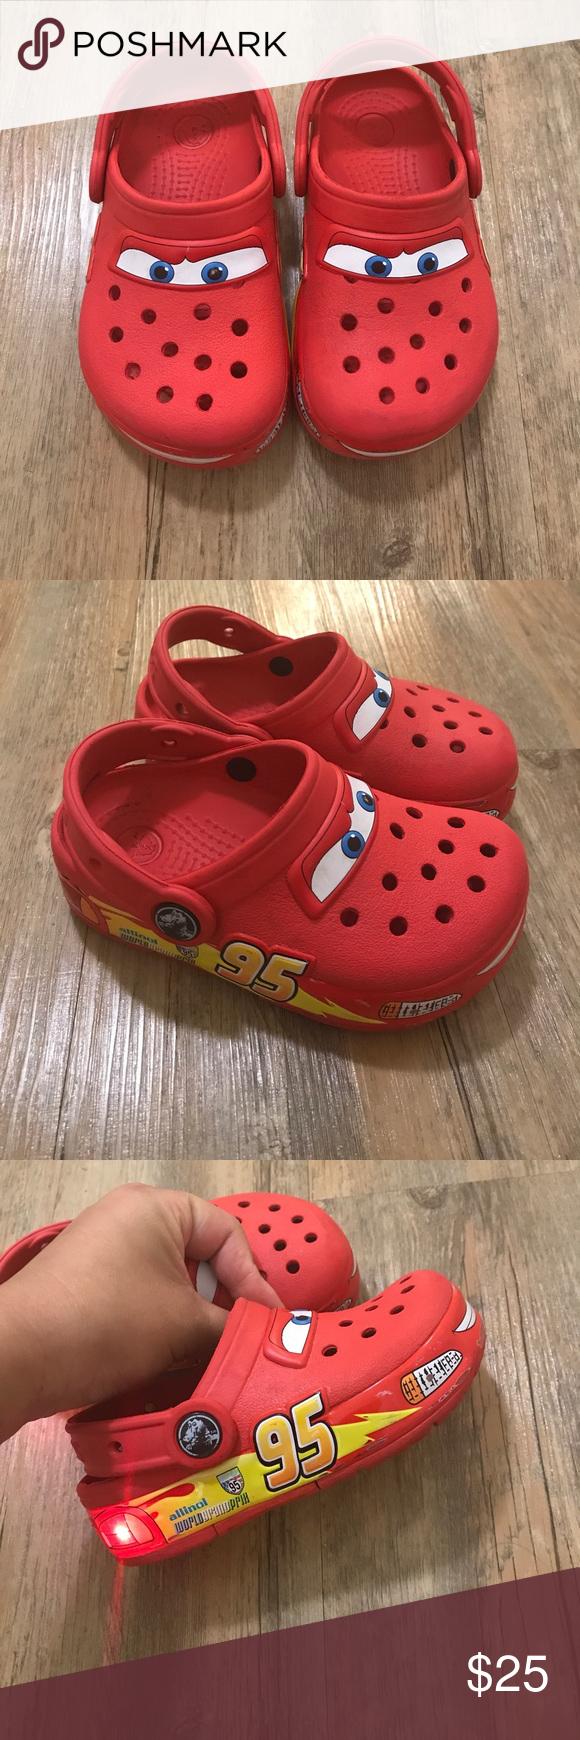 Disney Cars light up crocs kids size 9